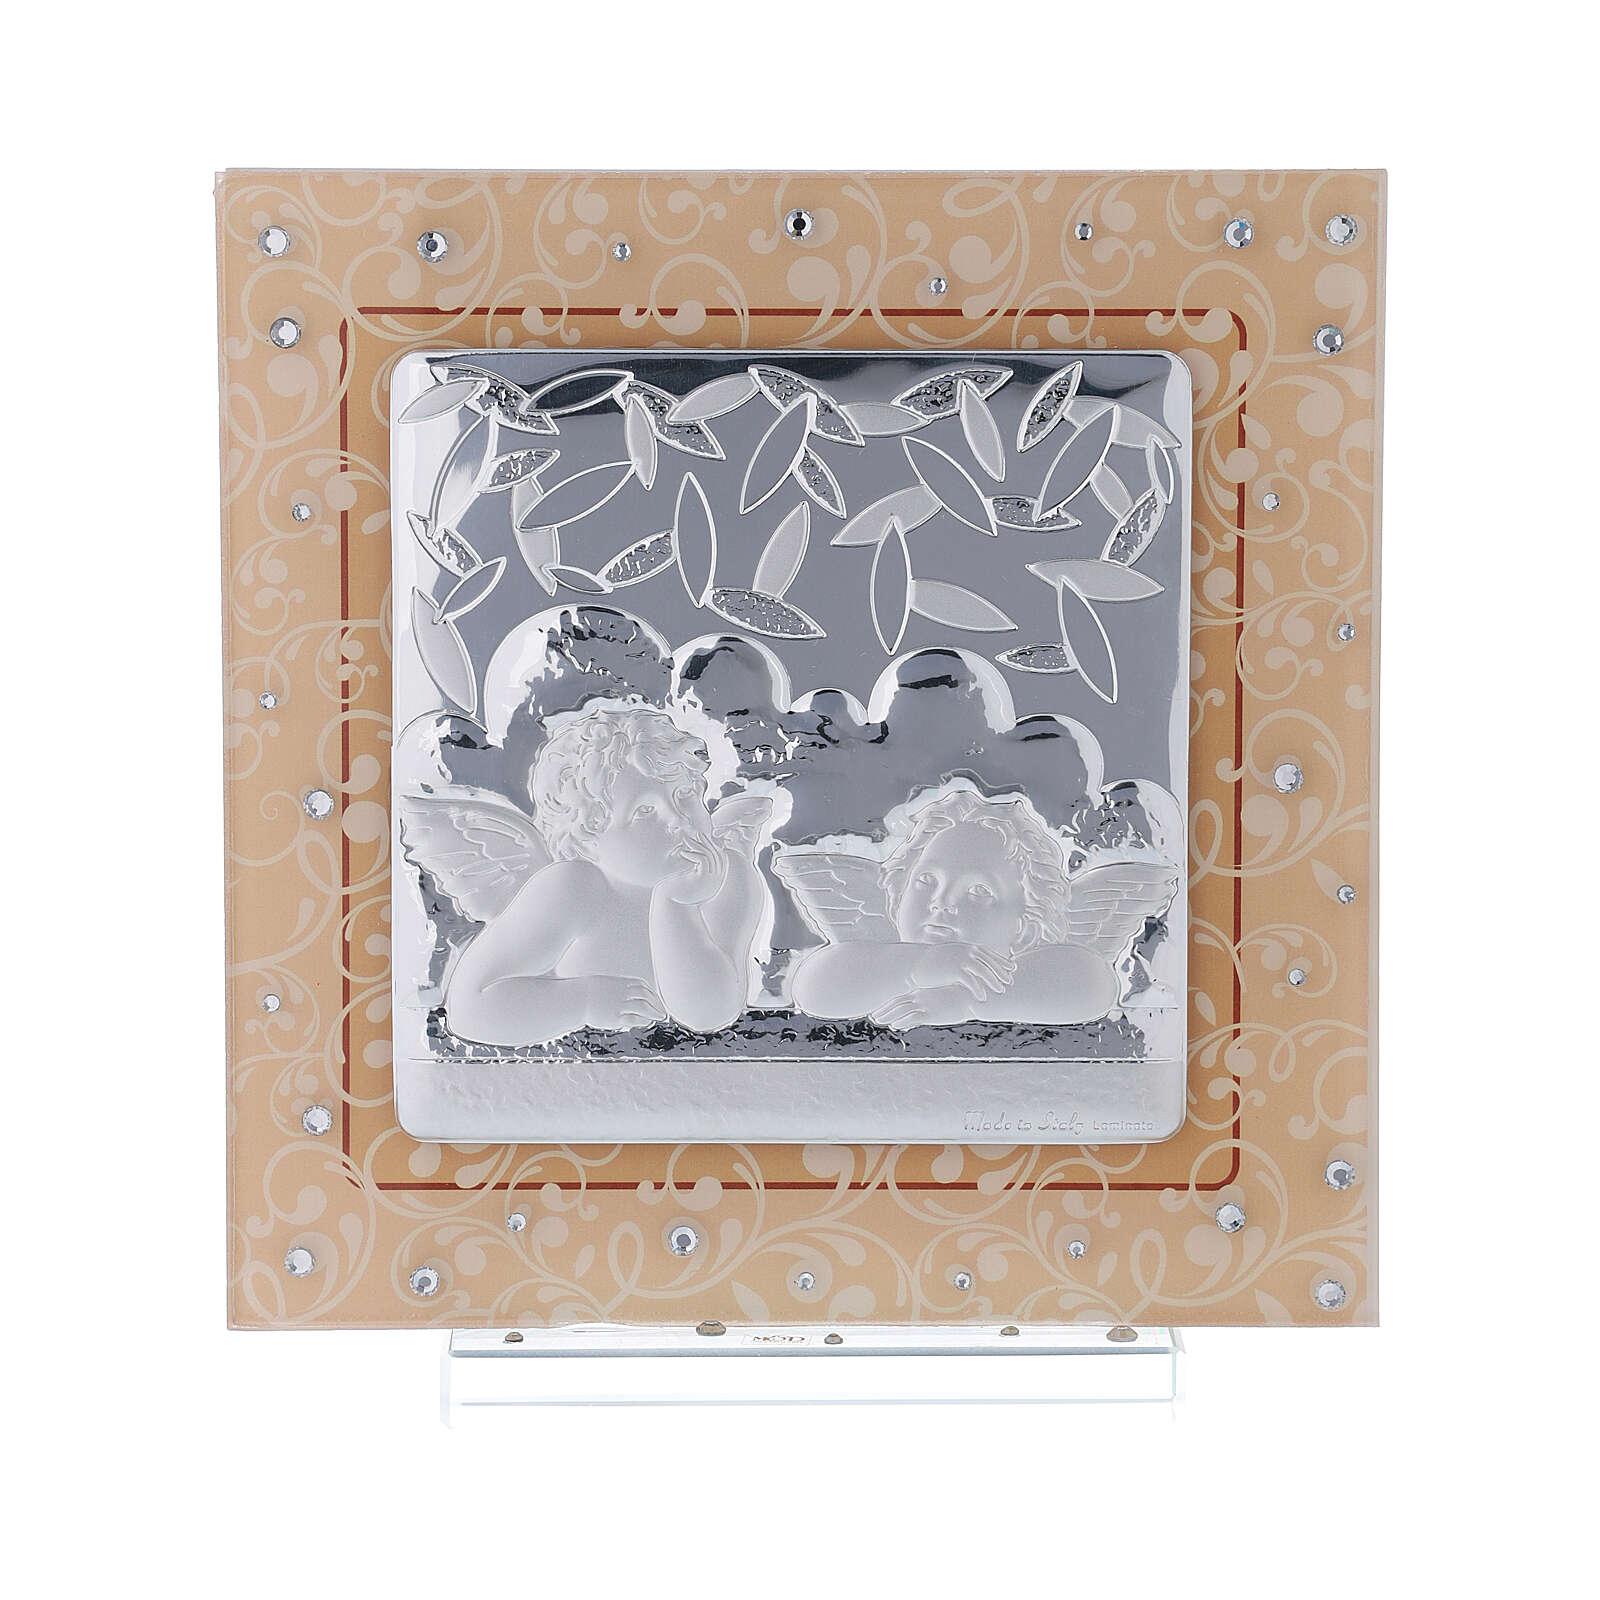 Cadre anges argent verre Murano ambre strass 17x17 cm 3